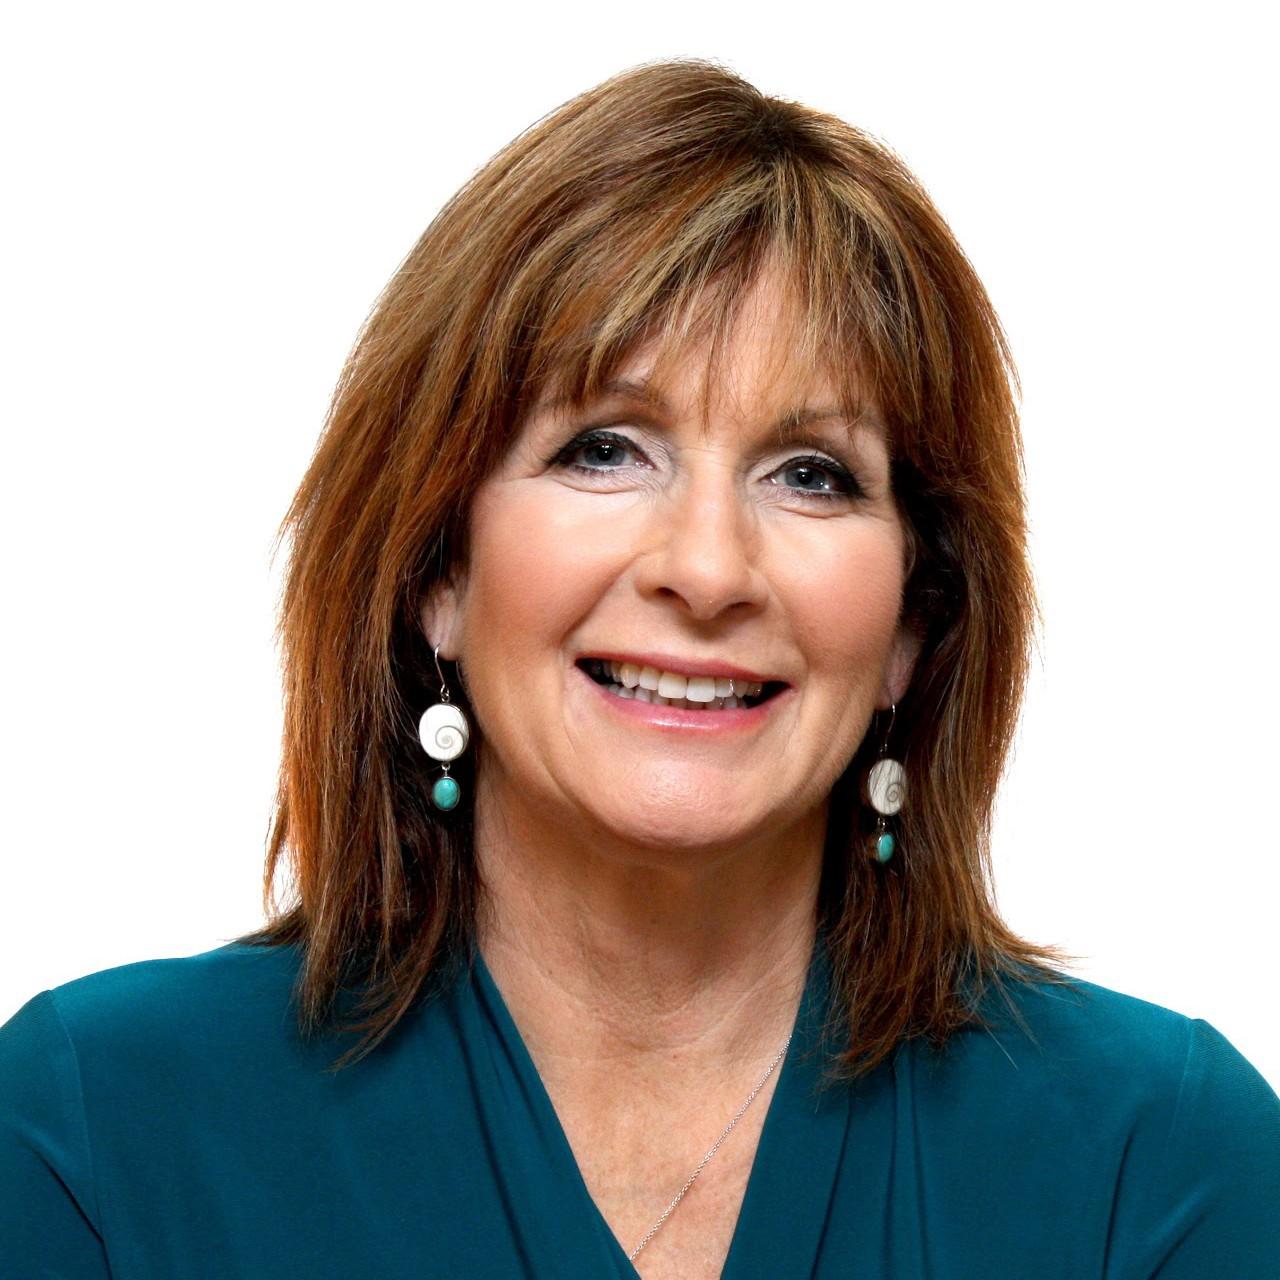 Lorraine Lloyd Headshot